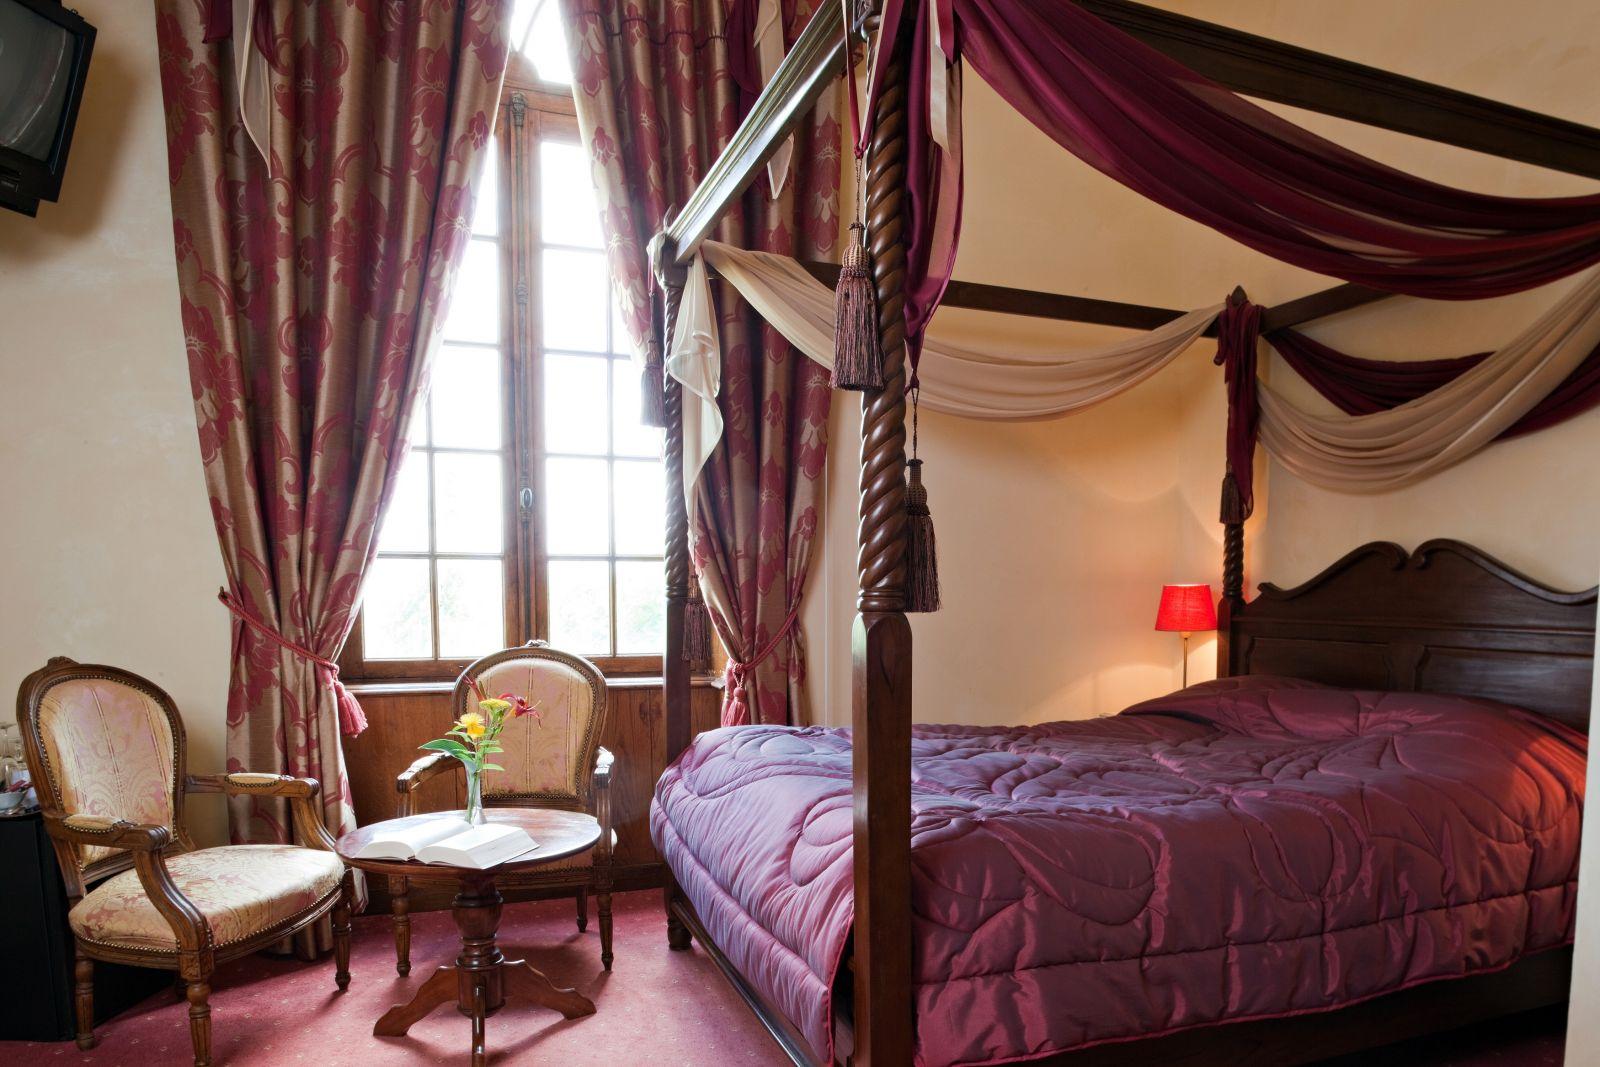 Дизайн спальни 18 кв м с балдахином